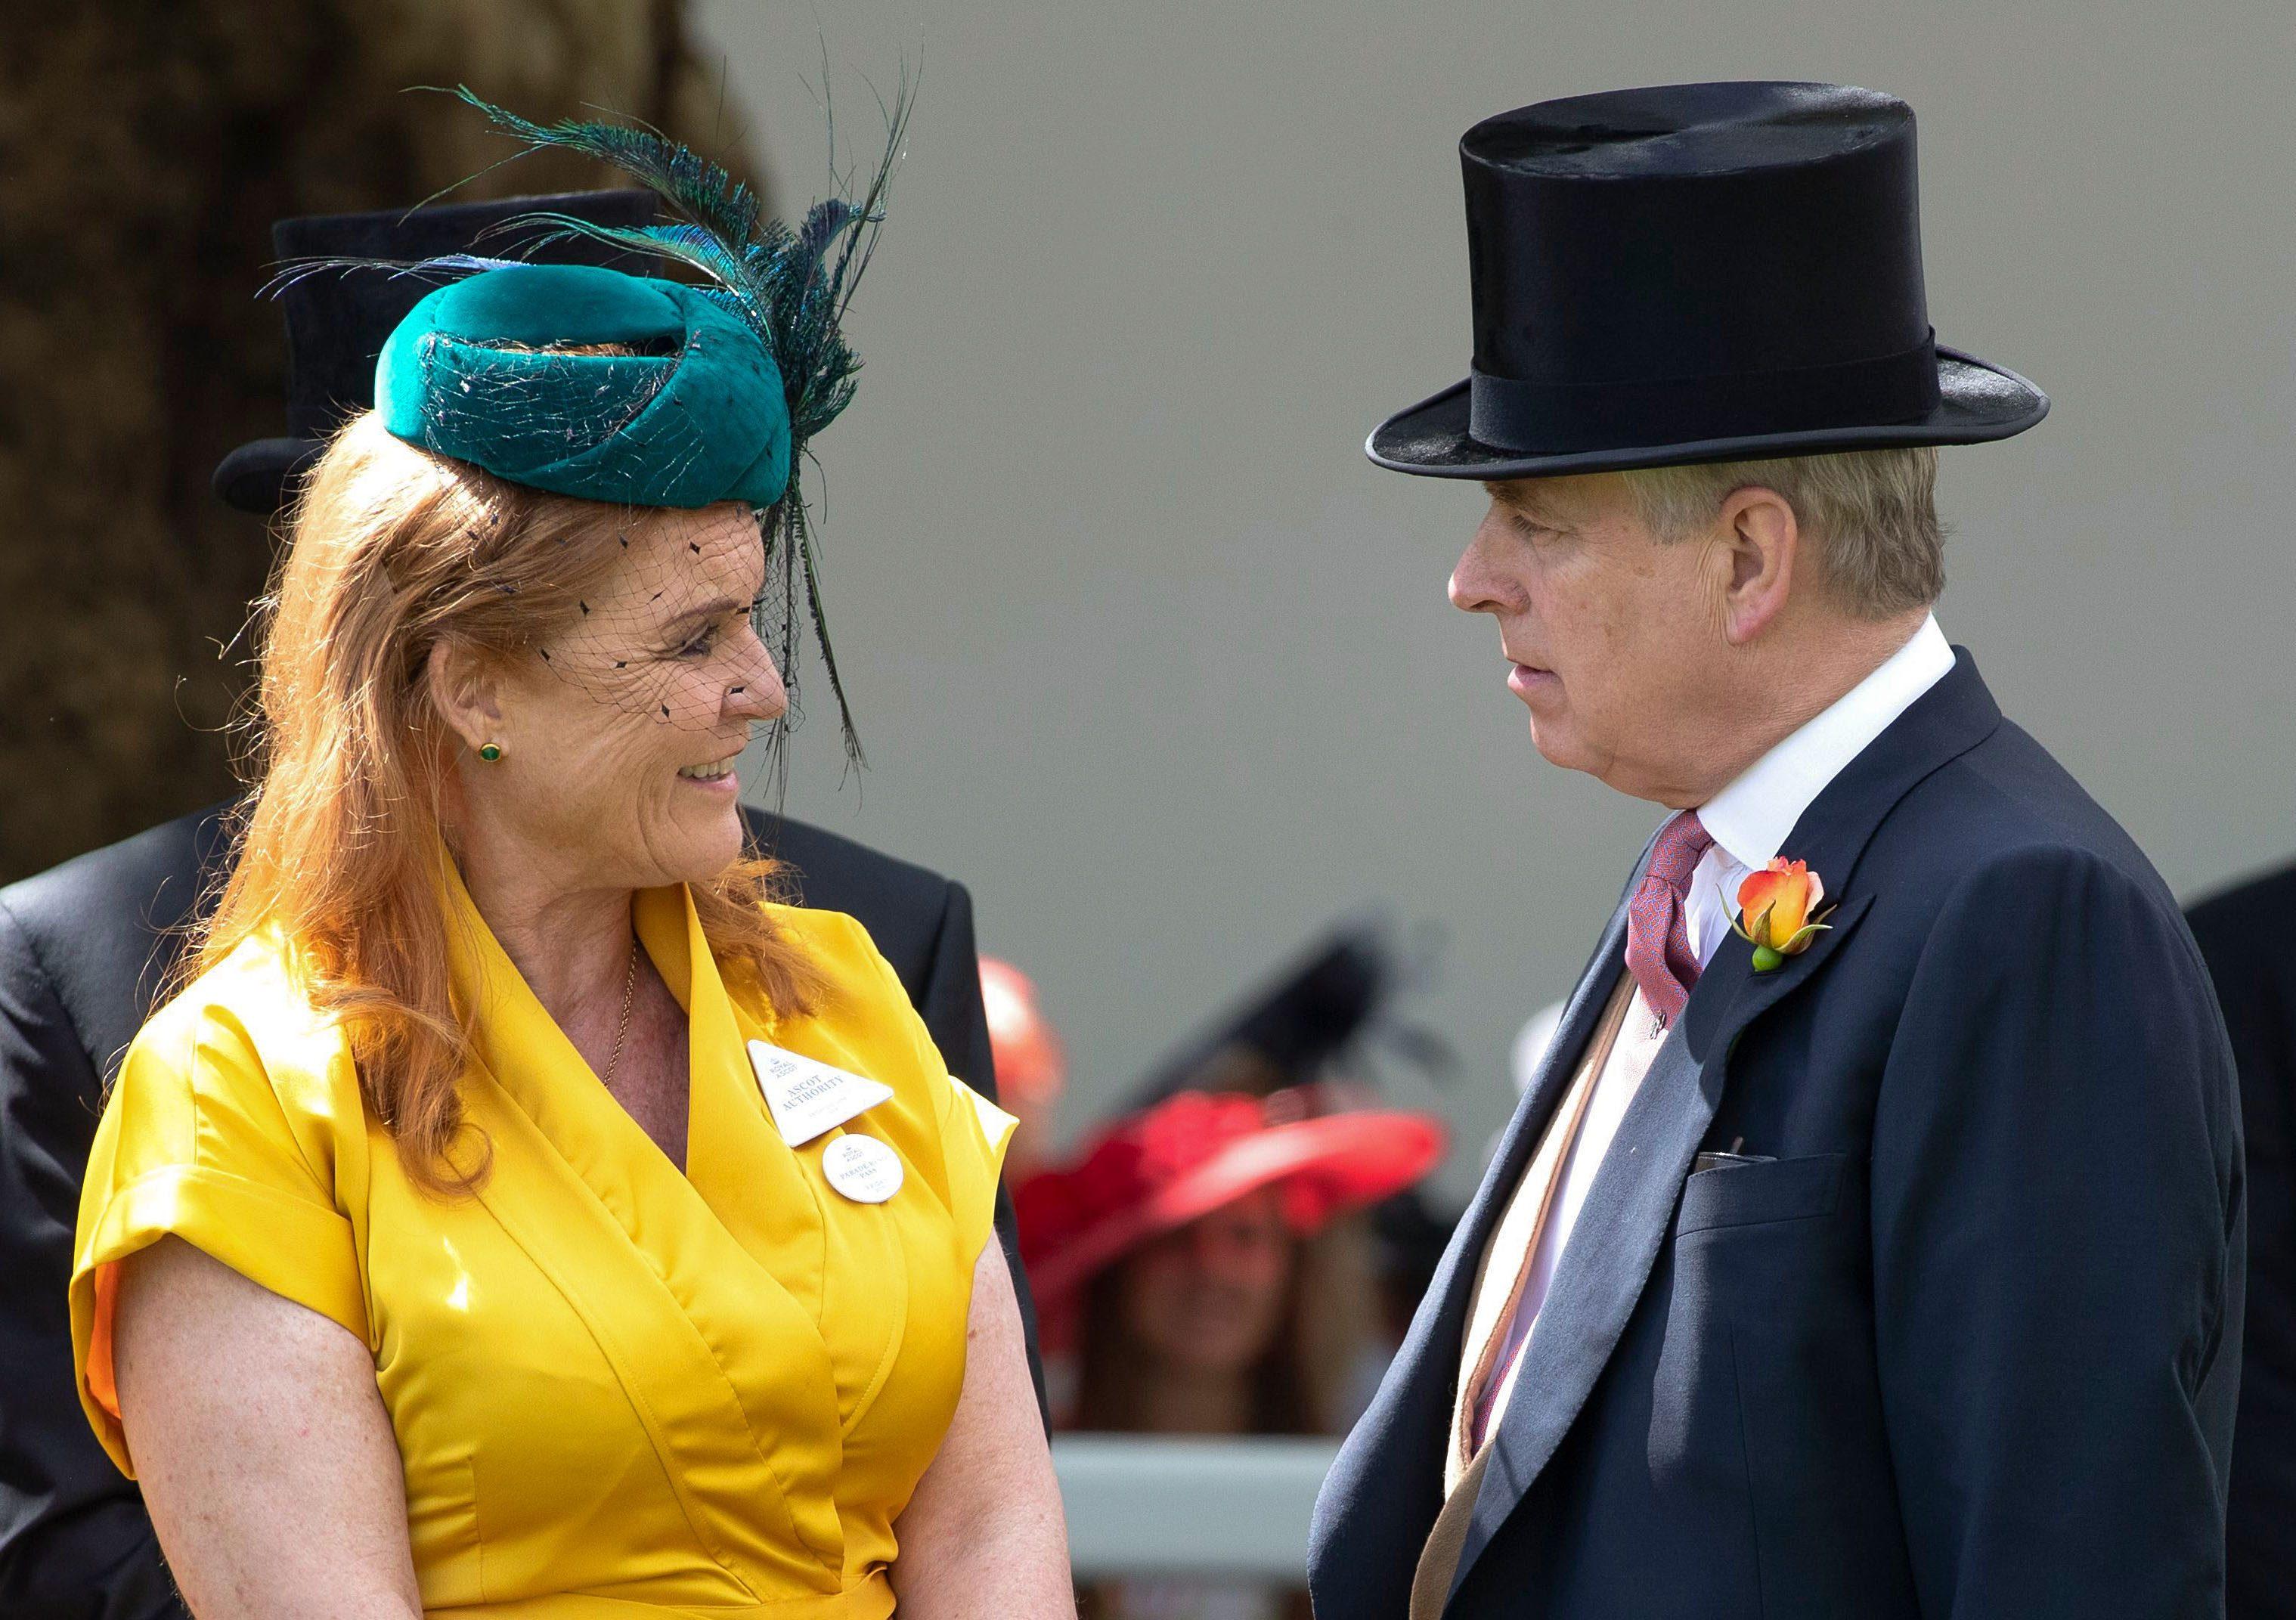 Mandatory Credit: Photo by Shutterstock (10318541i) Sarah Ferguson Duchess of York and Prince Andrew Royal Ascot, Day 4, UK - 21 Jun 2019